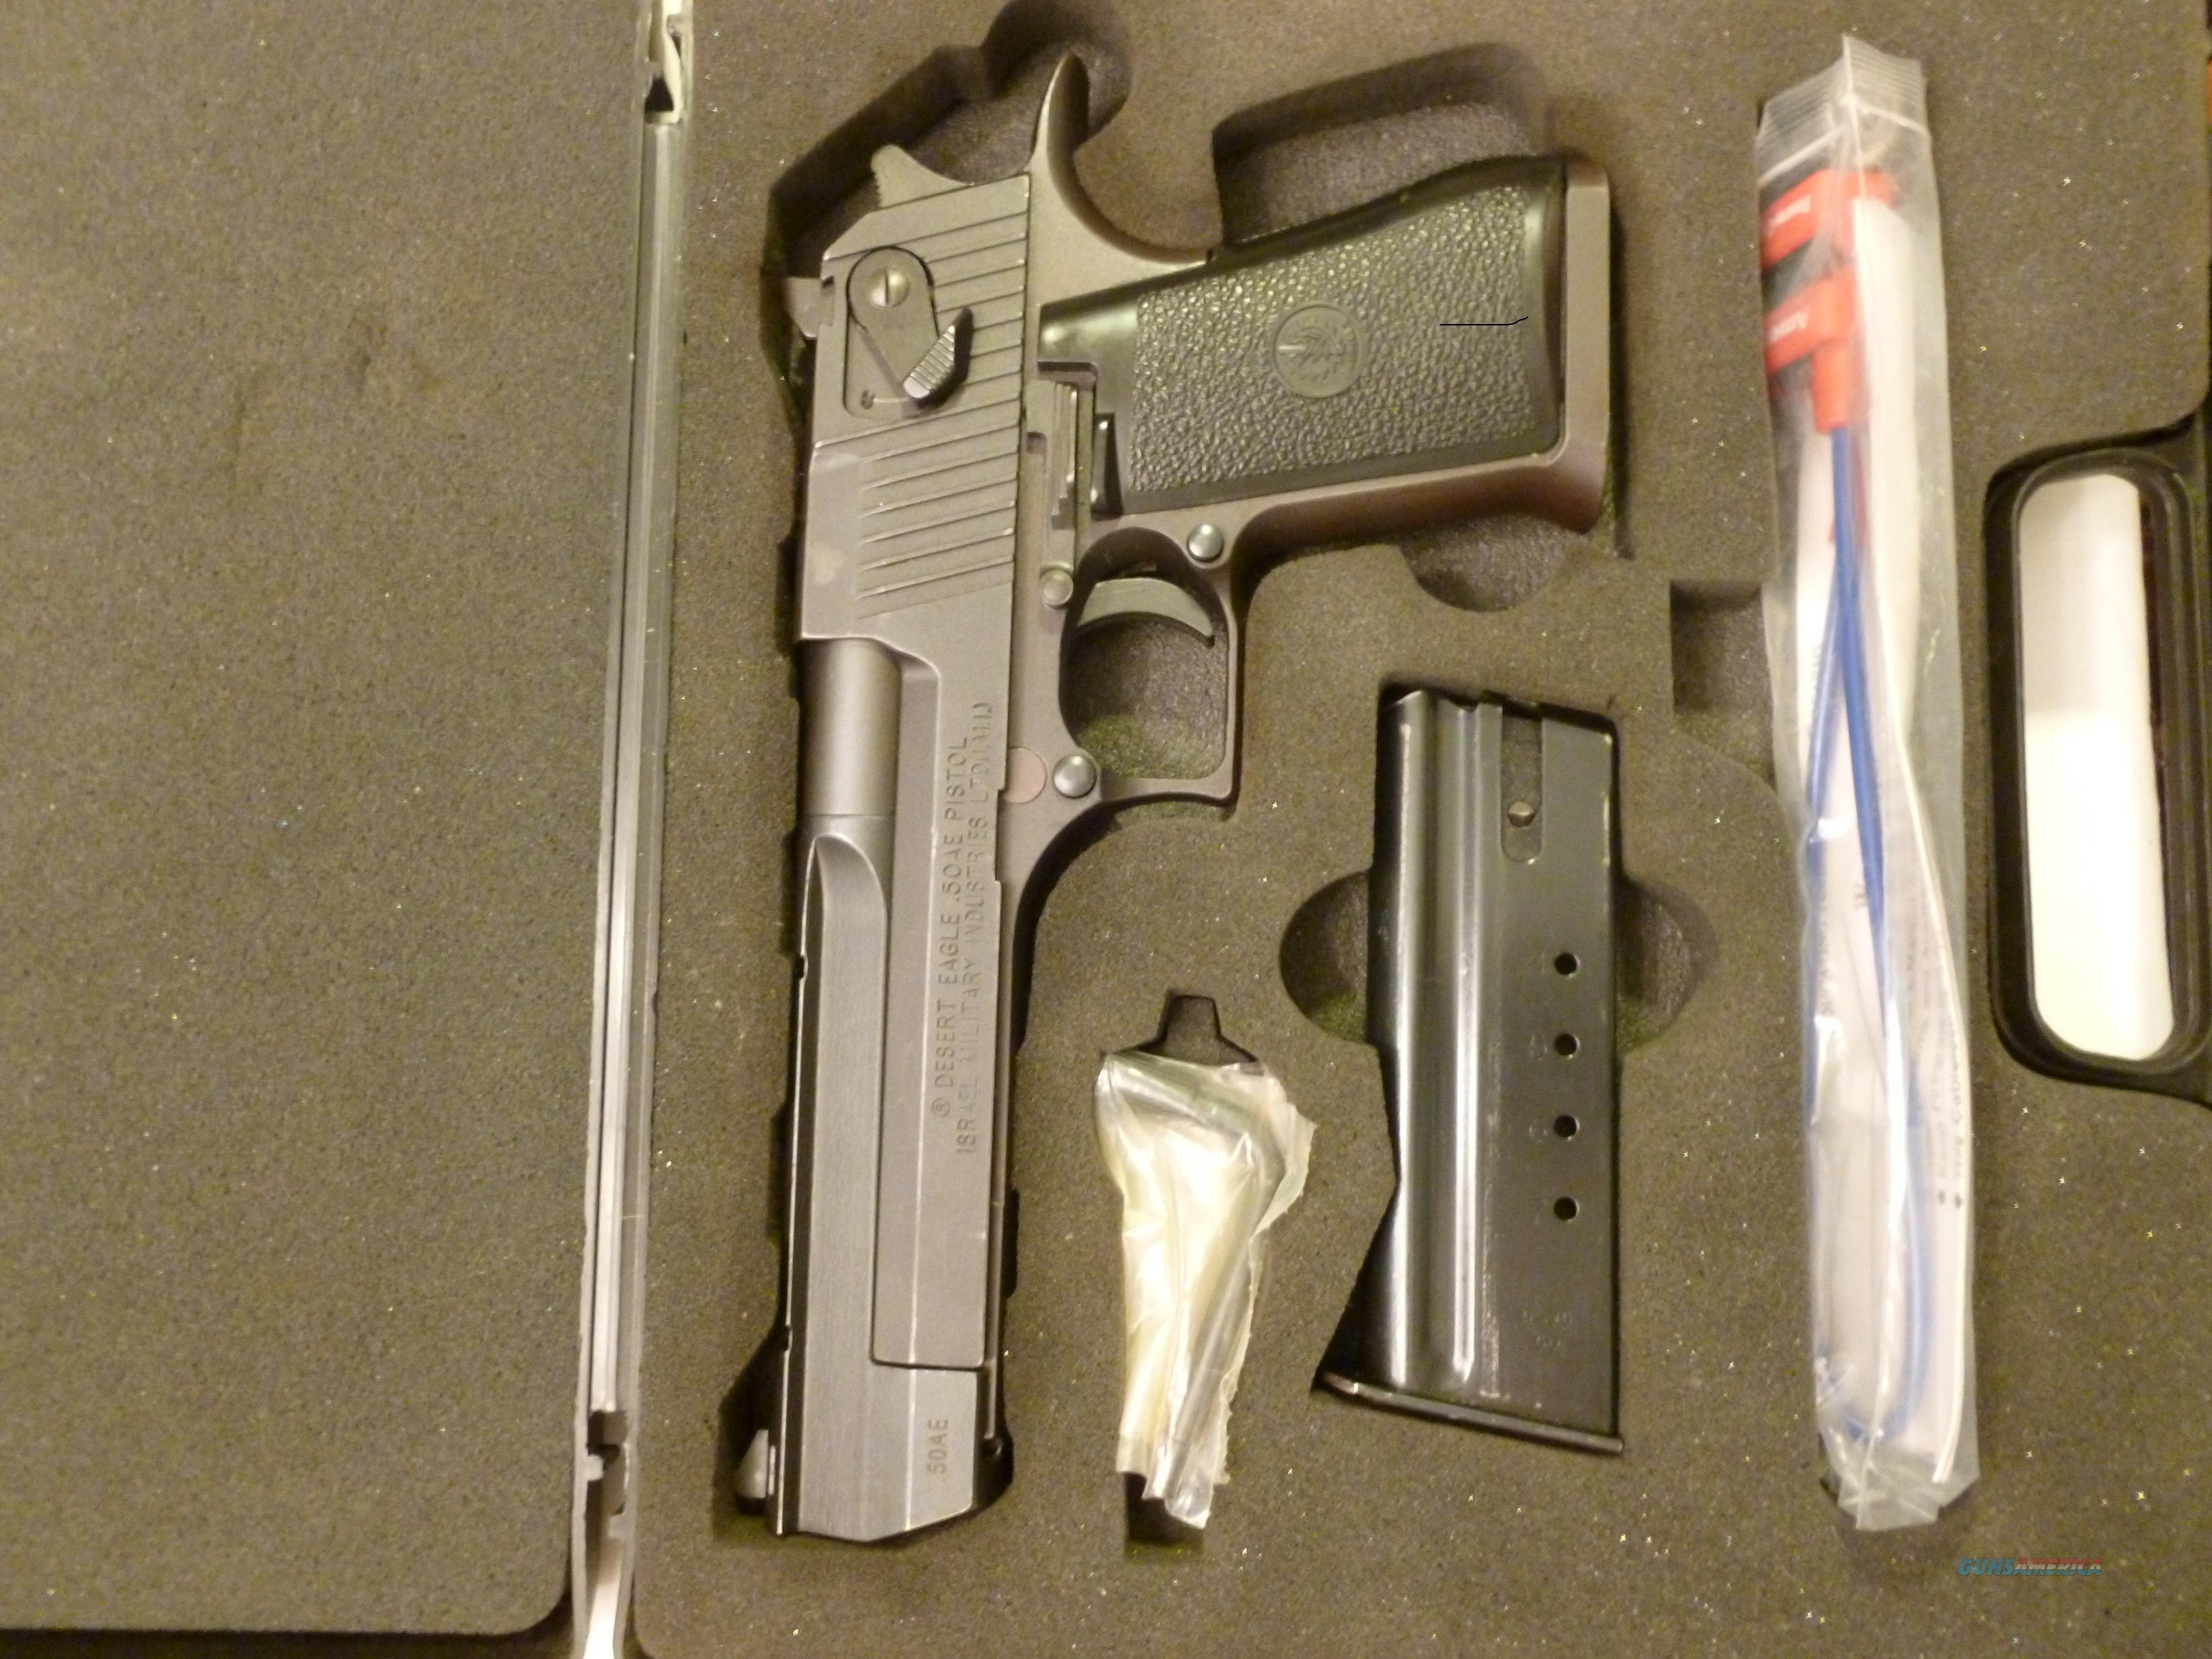 Desert Eagle Magnum Research  Guns > Pistols > Desert Eagle/IMI Pistols > Desert Eagle